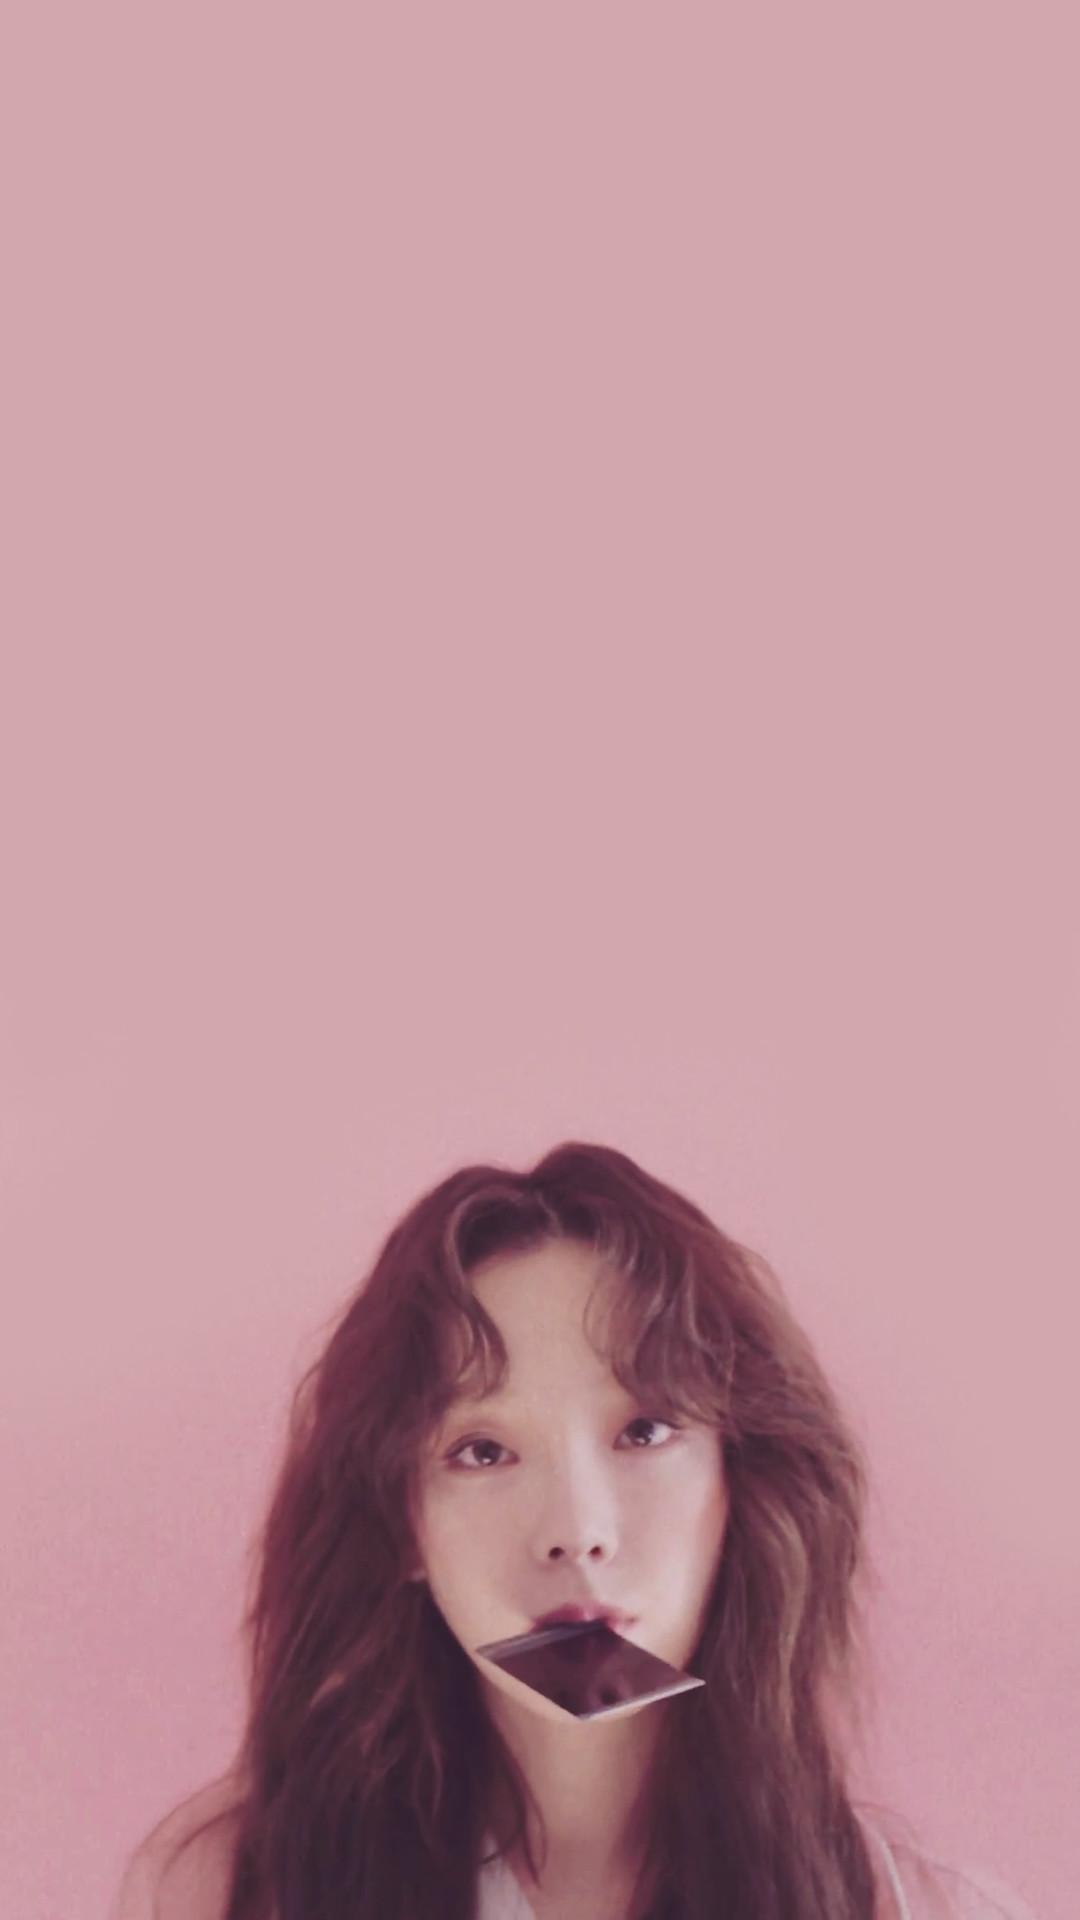 Snsd Hd Wallpaper 1920x1080 Snsd Taeyeon Wallpaper 81 Images